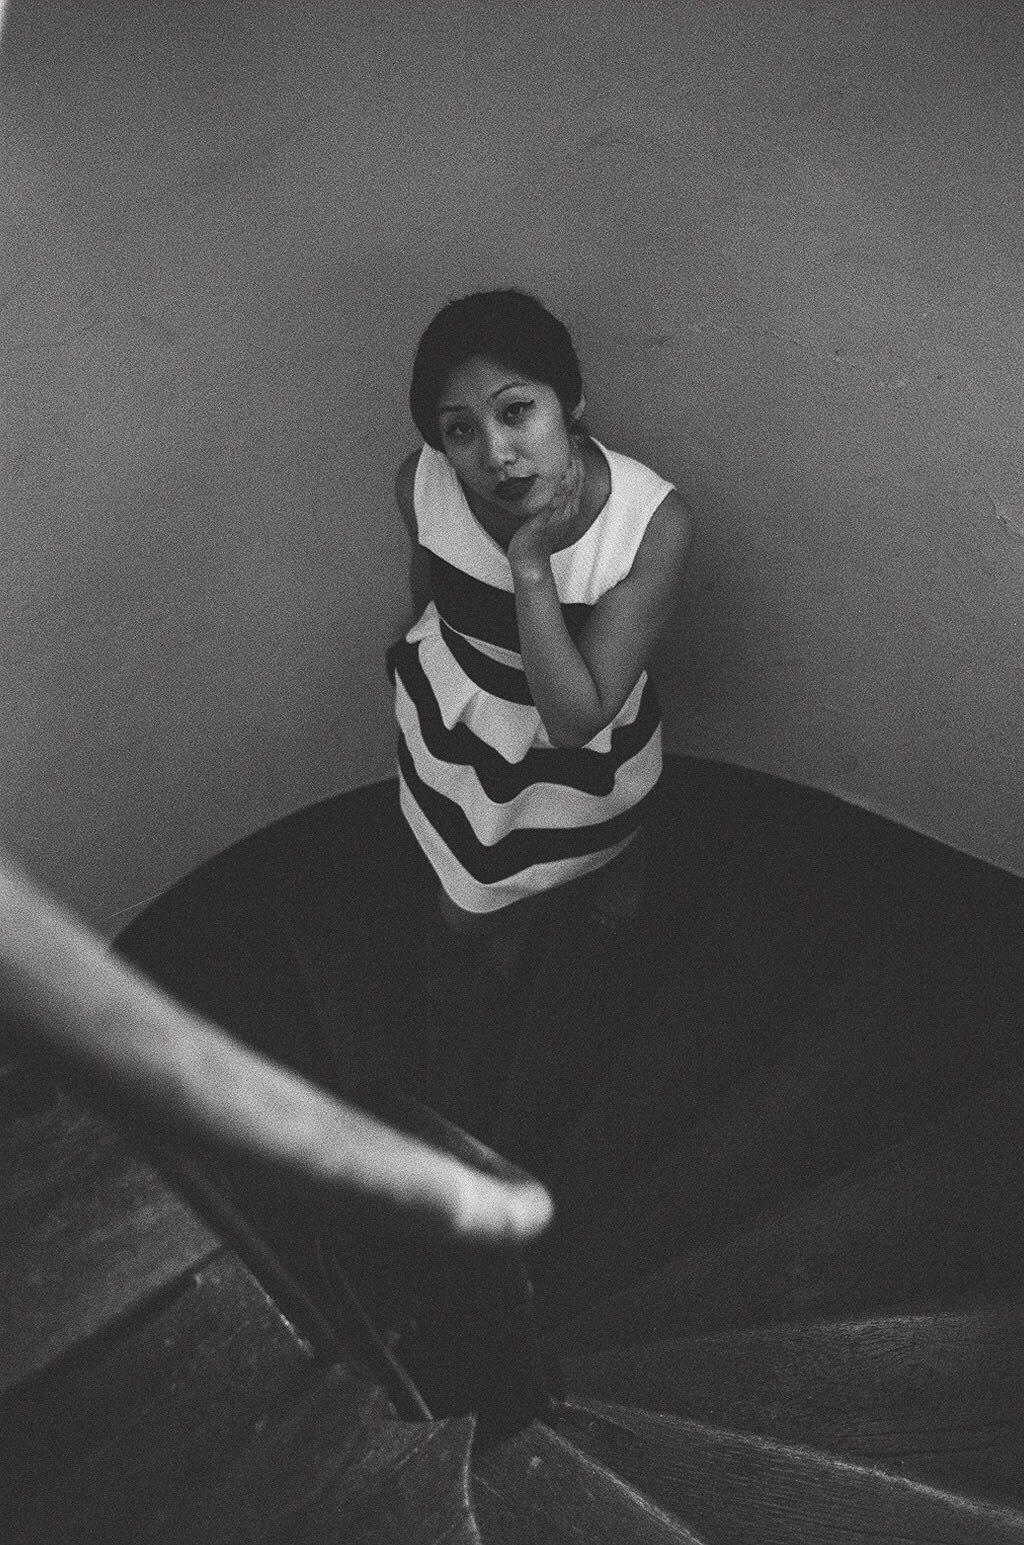 eric kim photography black and white tri x 1600 leica mp 35mm film-1170